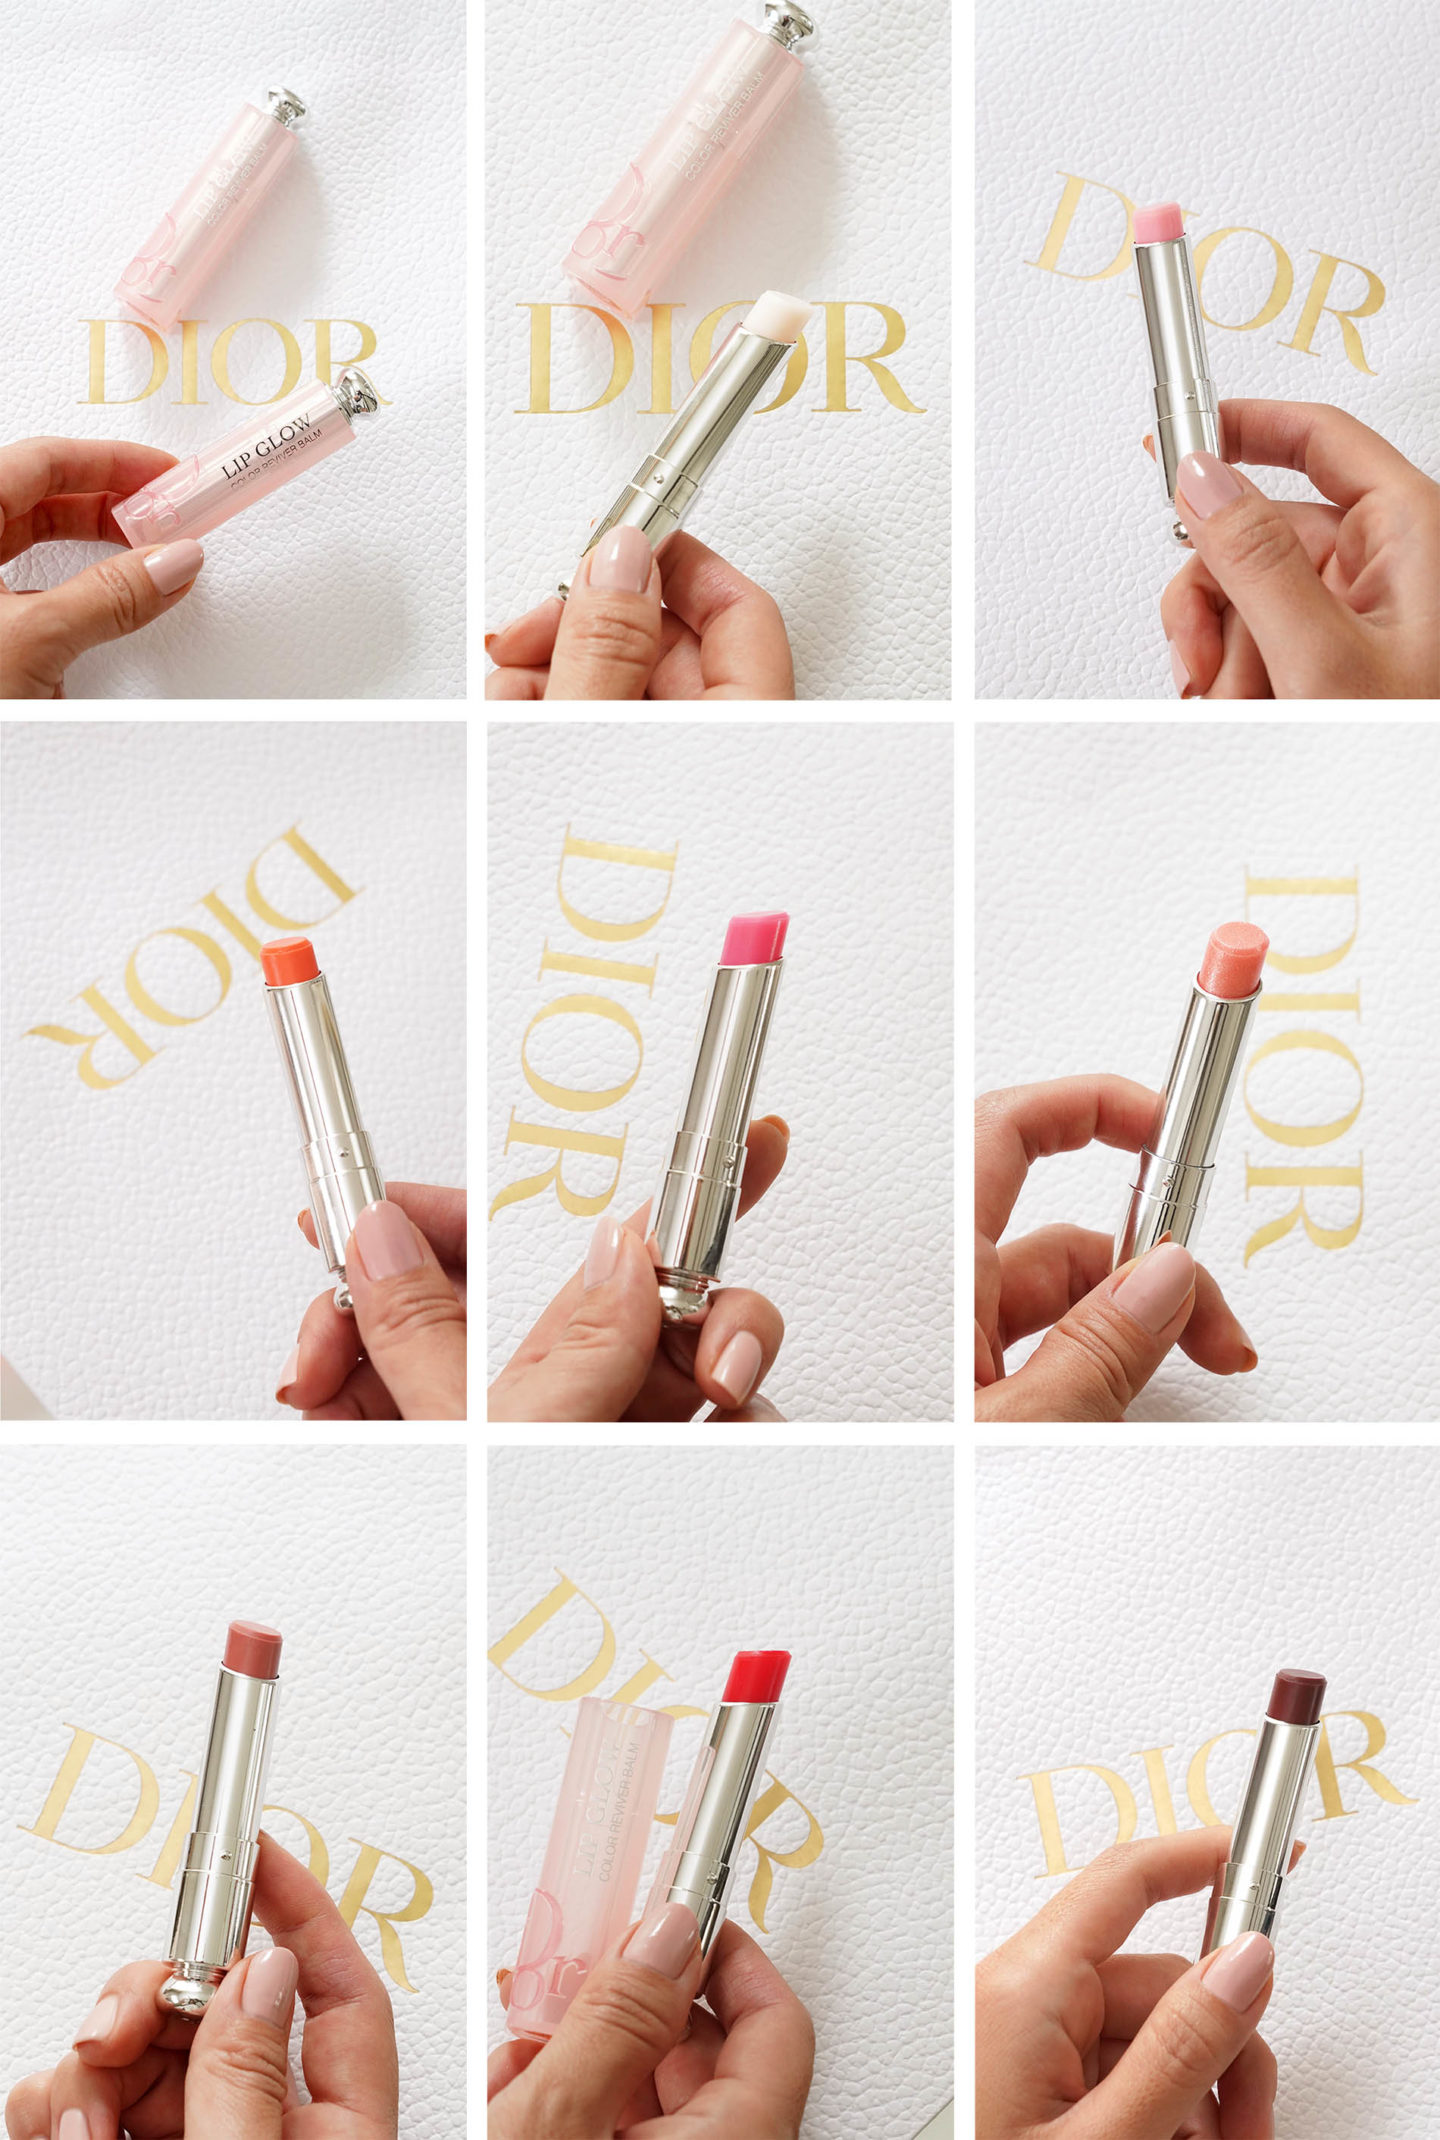 Dior Lip Glow |  Look Book Beauté